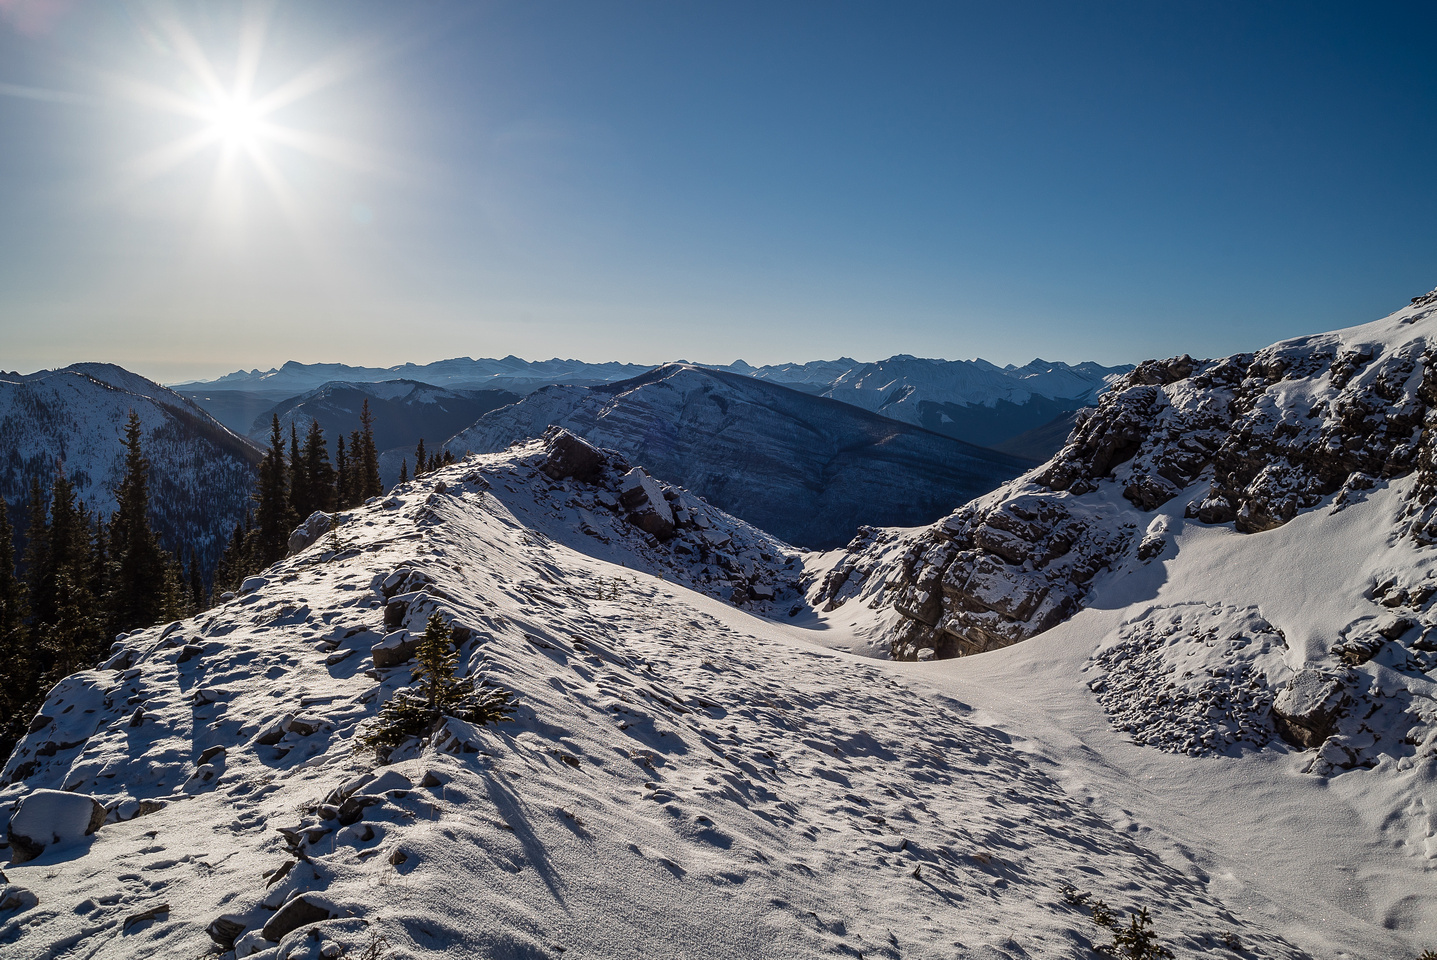 Interesting terrain on the ridge.